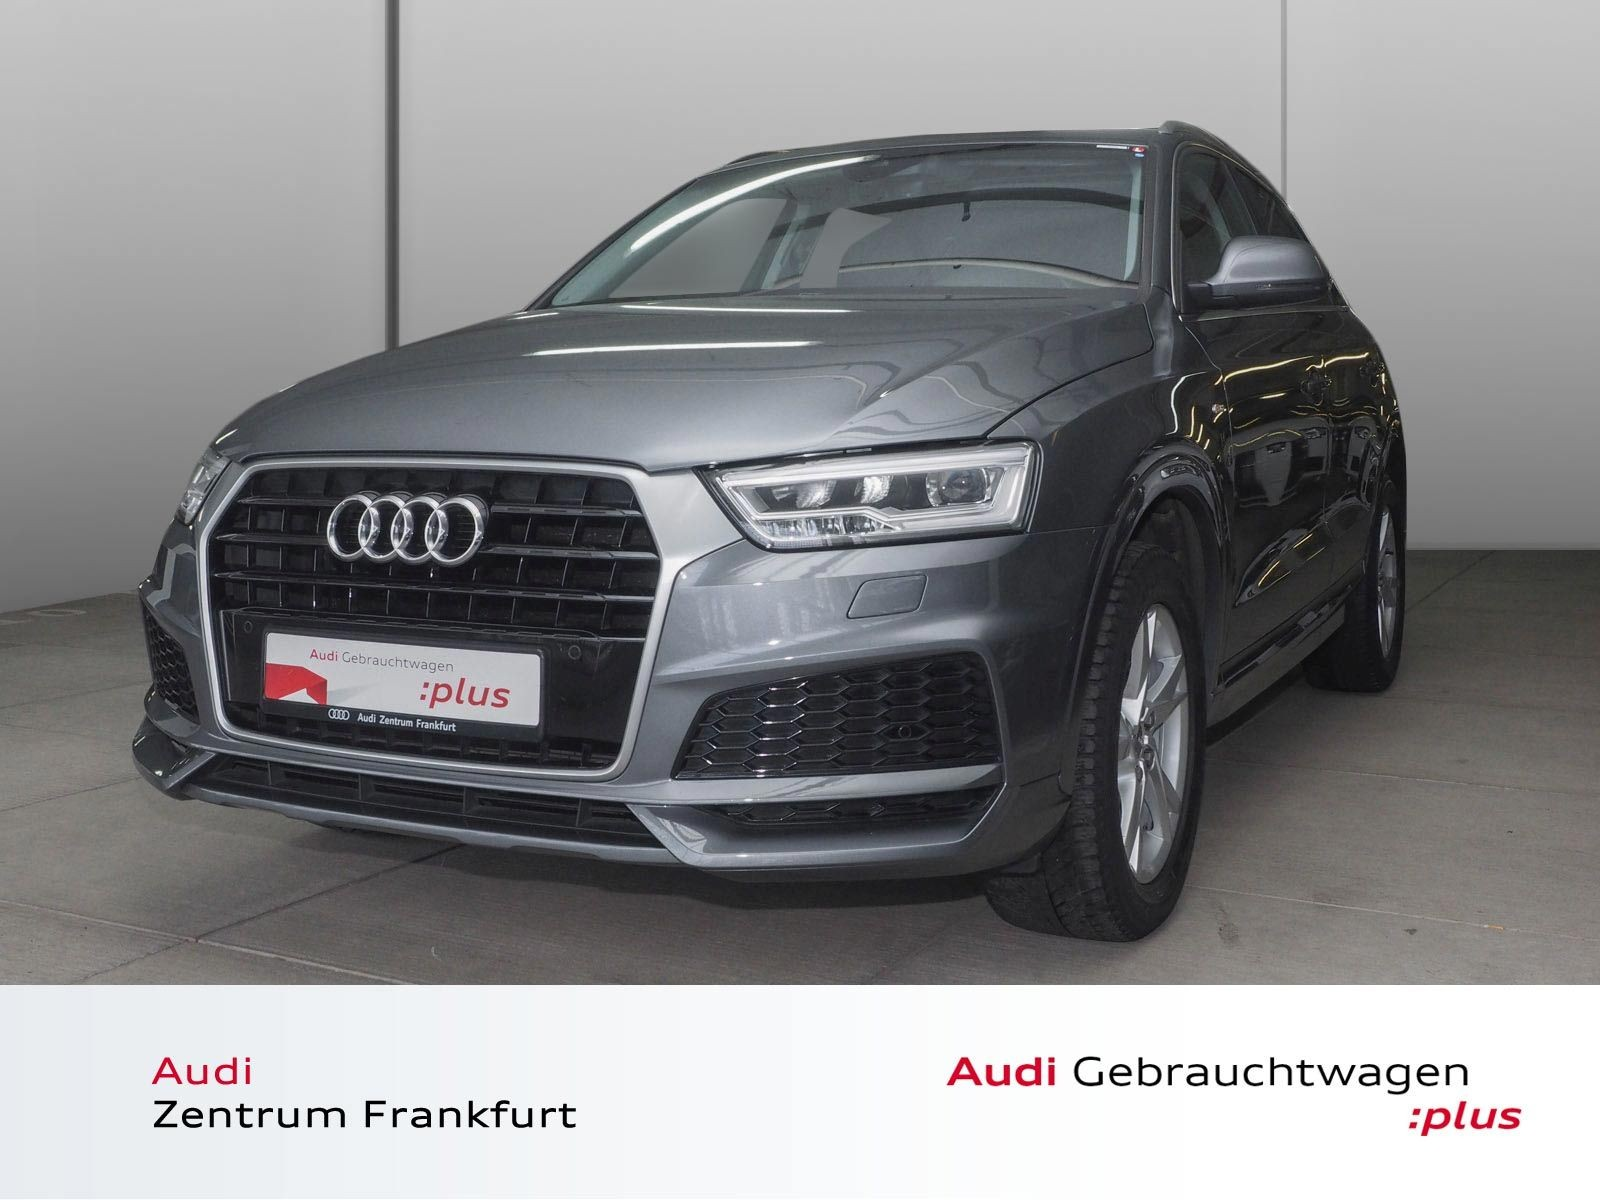 Audi Q3 2.0 TDI S tronic S line LED Navi Tempomat Panorama, Jahr 2017, Diesel